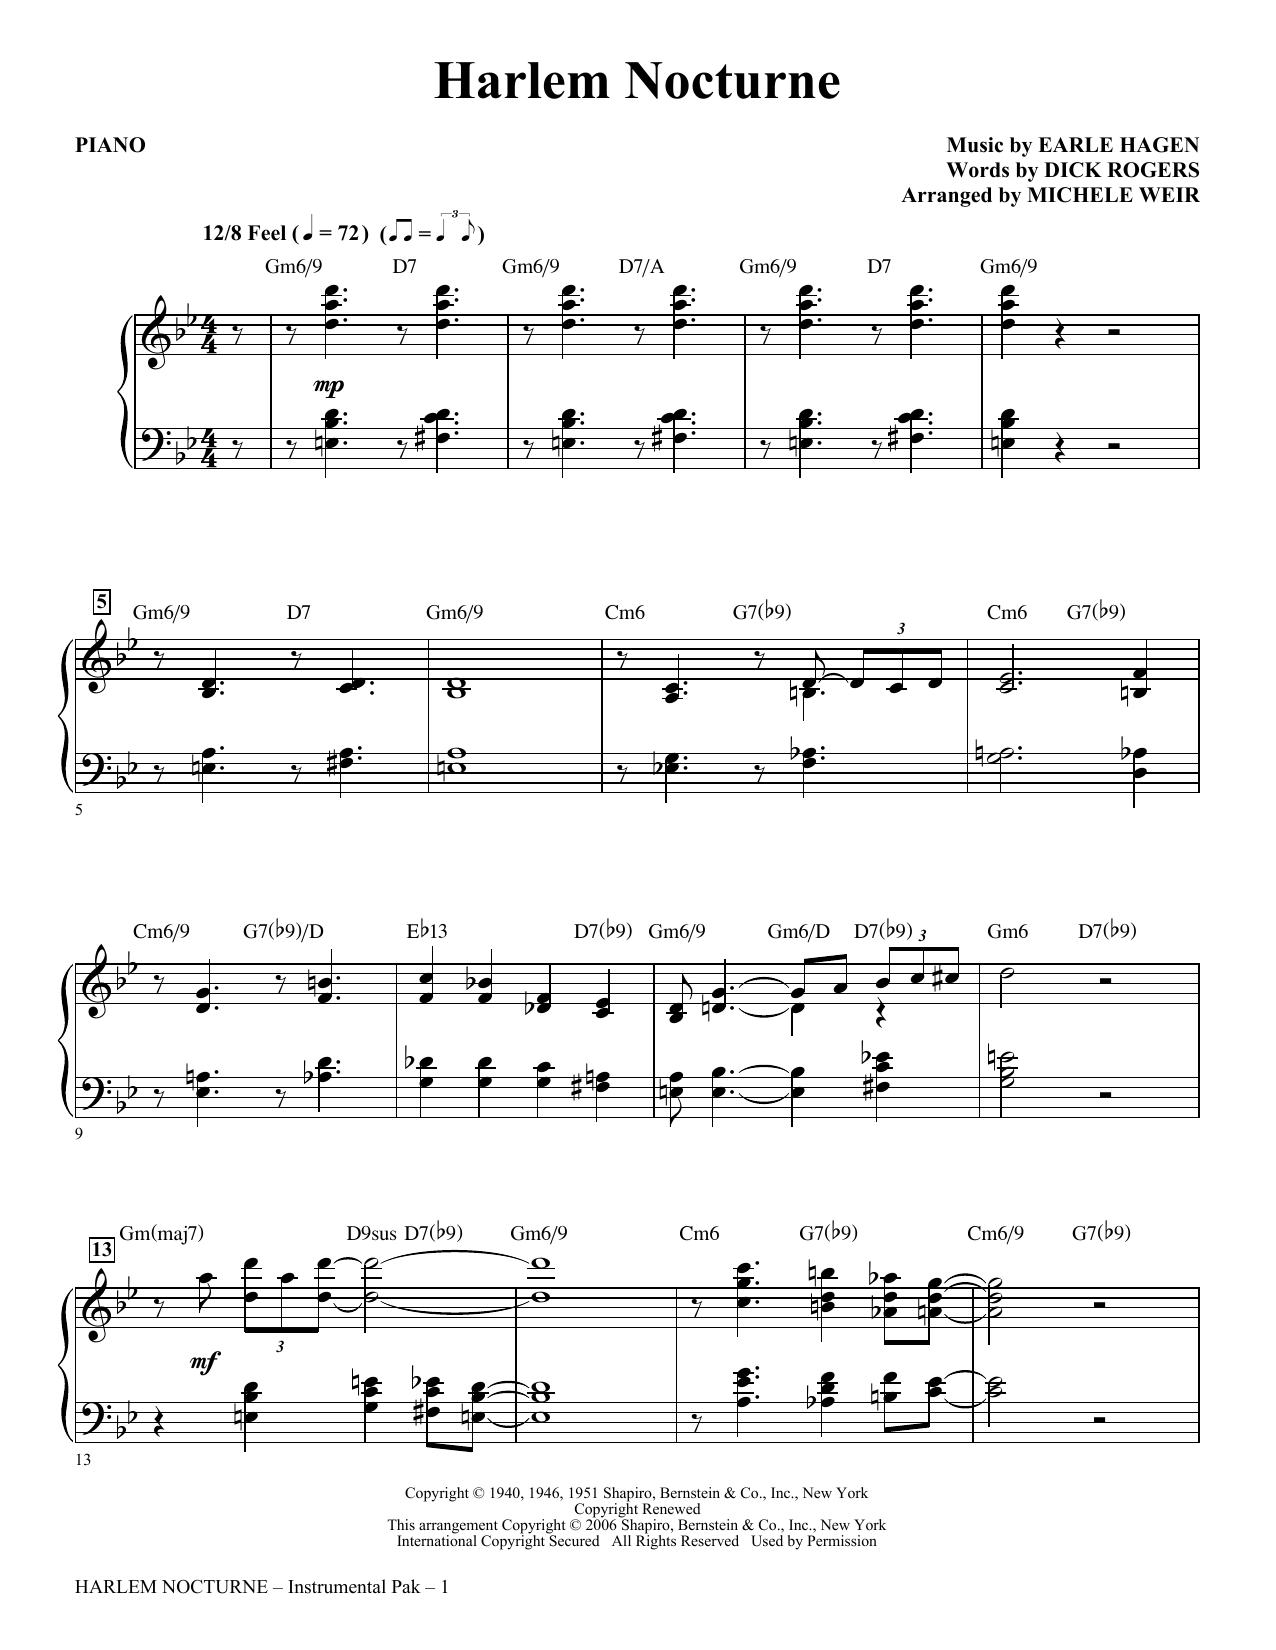 Harlem Nocturne (arr. Michele Weir) - Piano Sheet Music